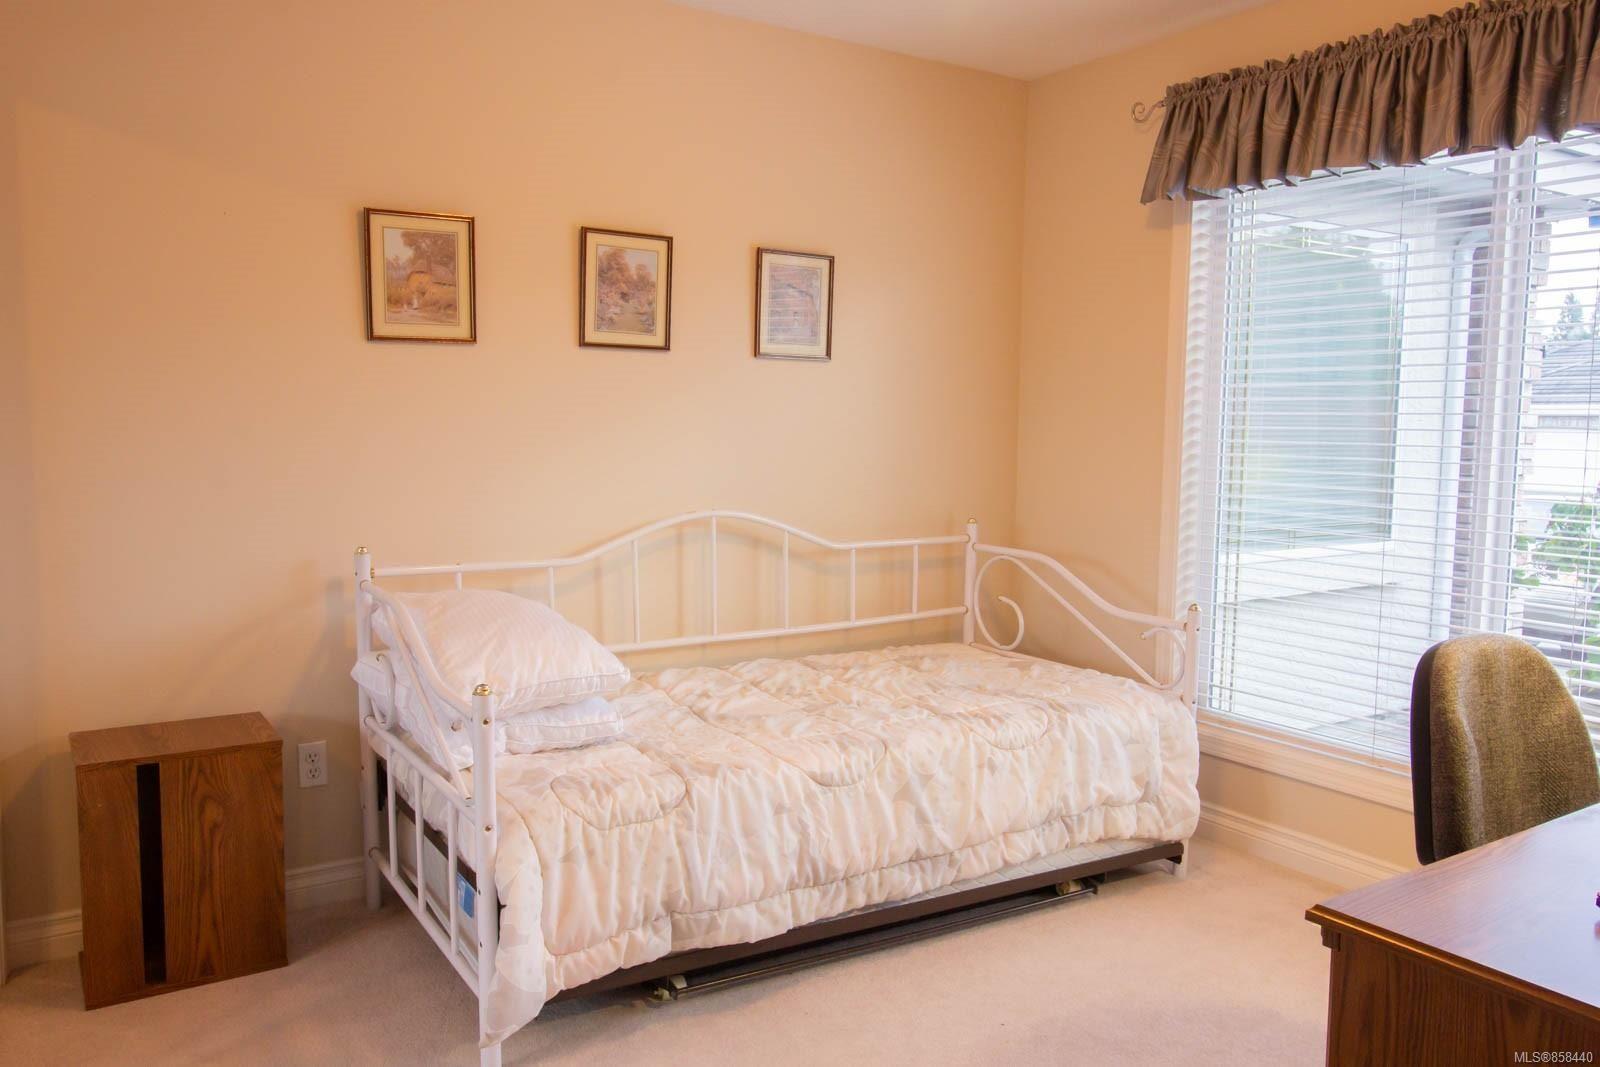 Photo 9: Photos: 798 Devon Pl in : PQ Qualicum Beach House for sale (Parksville/Qualicum)  : MLS®# 858440